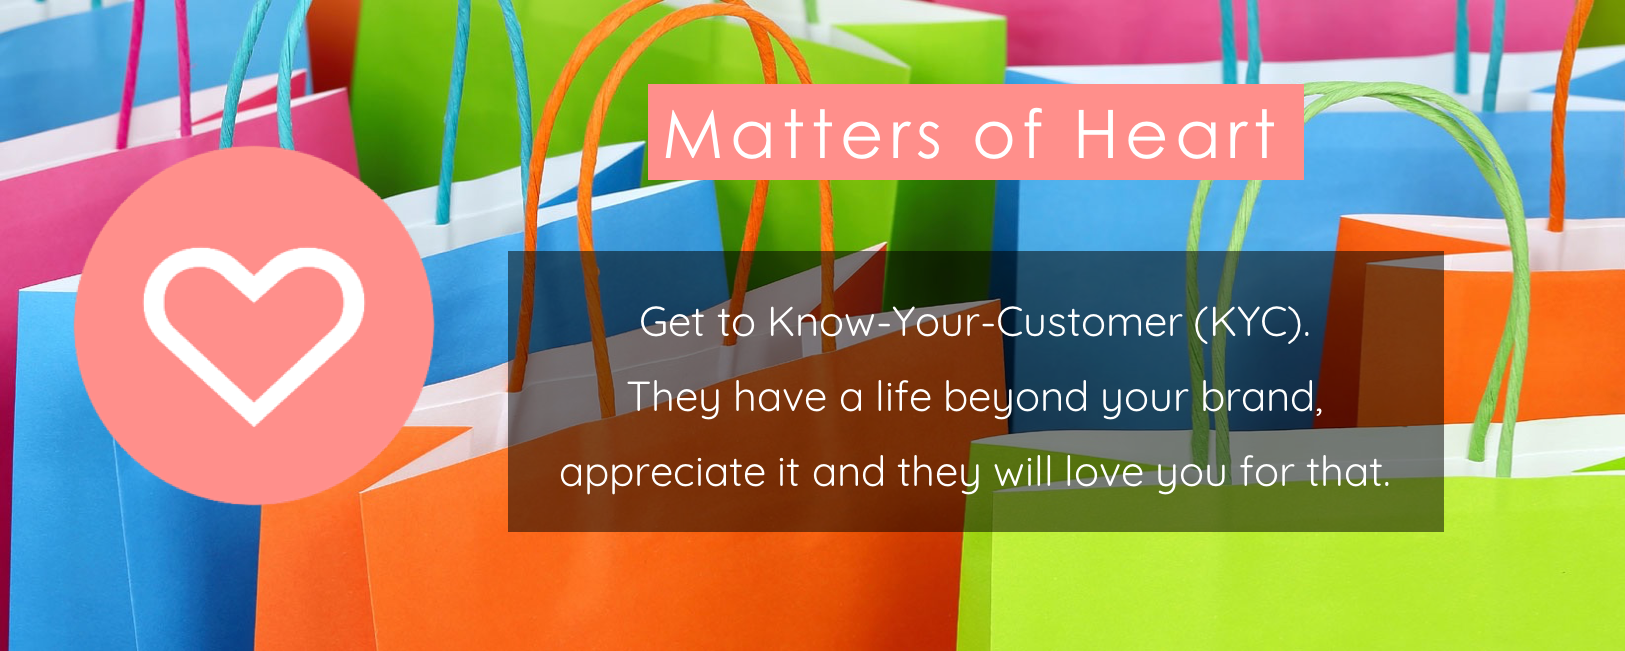 Matters of Heart